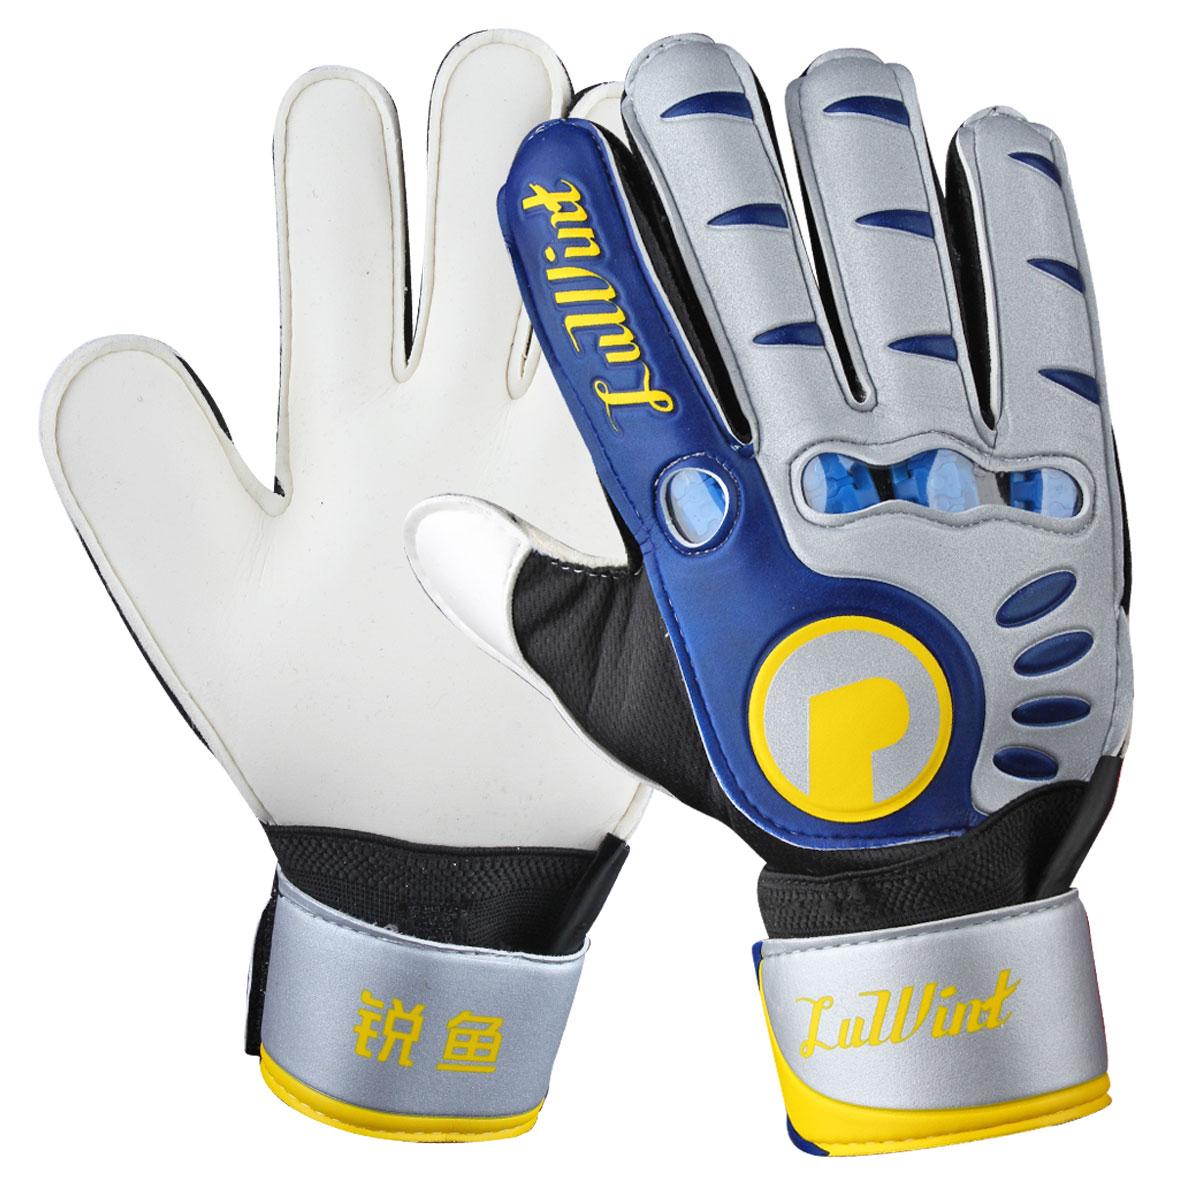 Receiver Gloves For Kids Gloves Kids Children